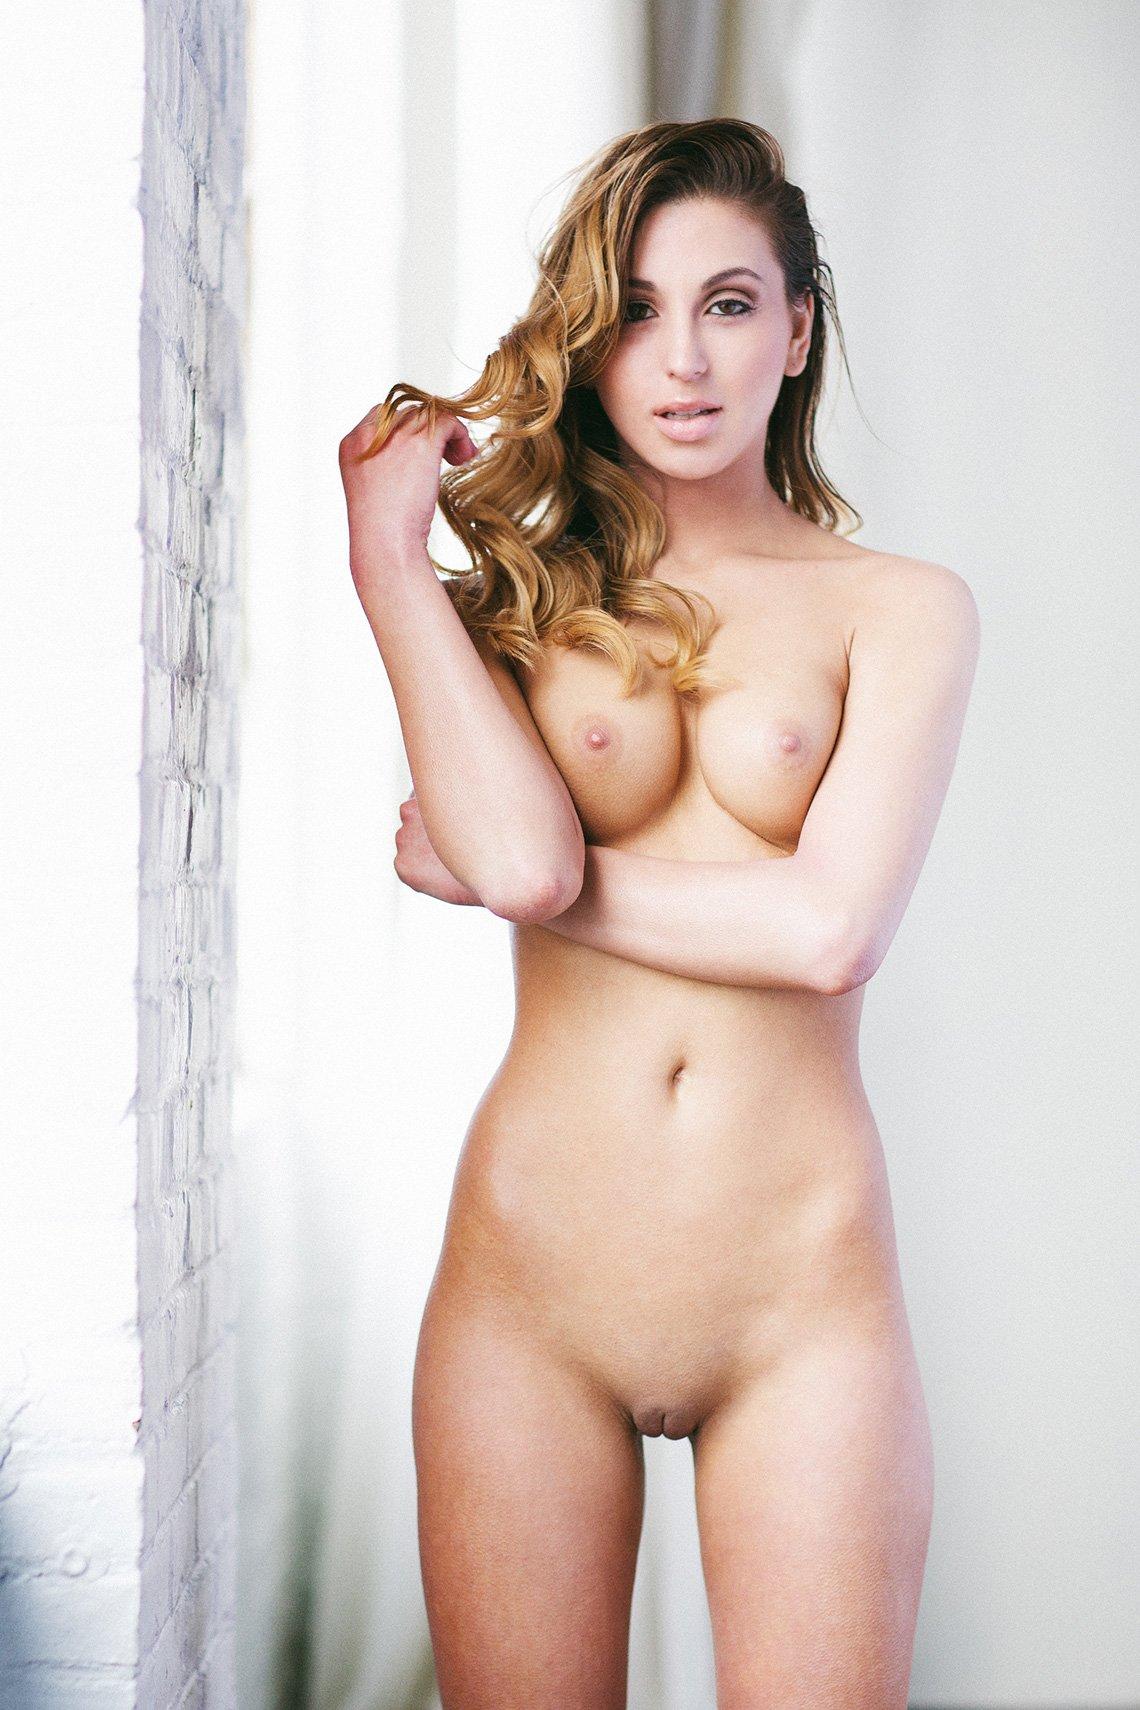 thais vieira nude